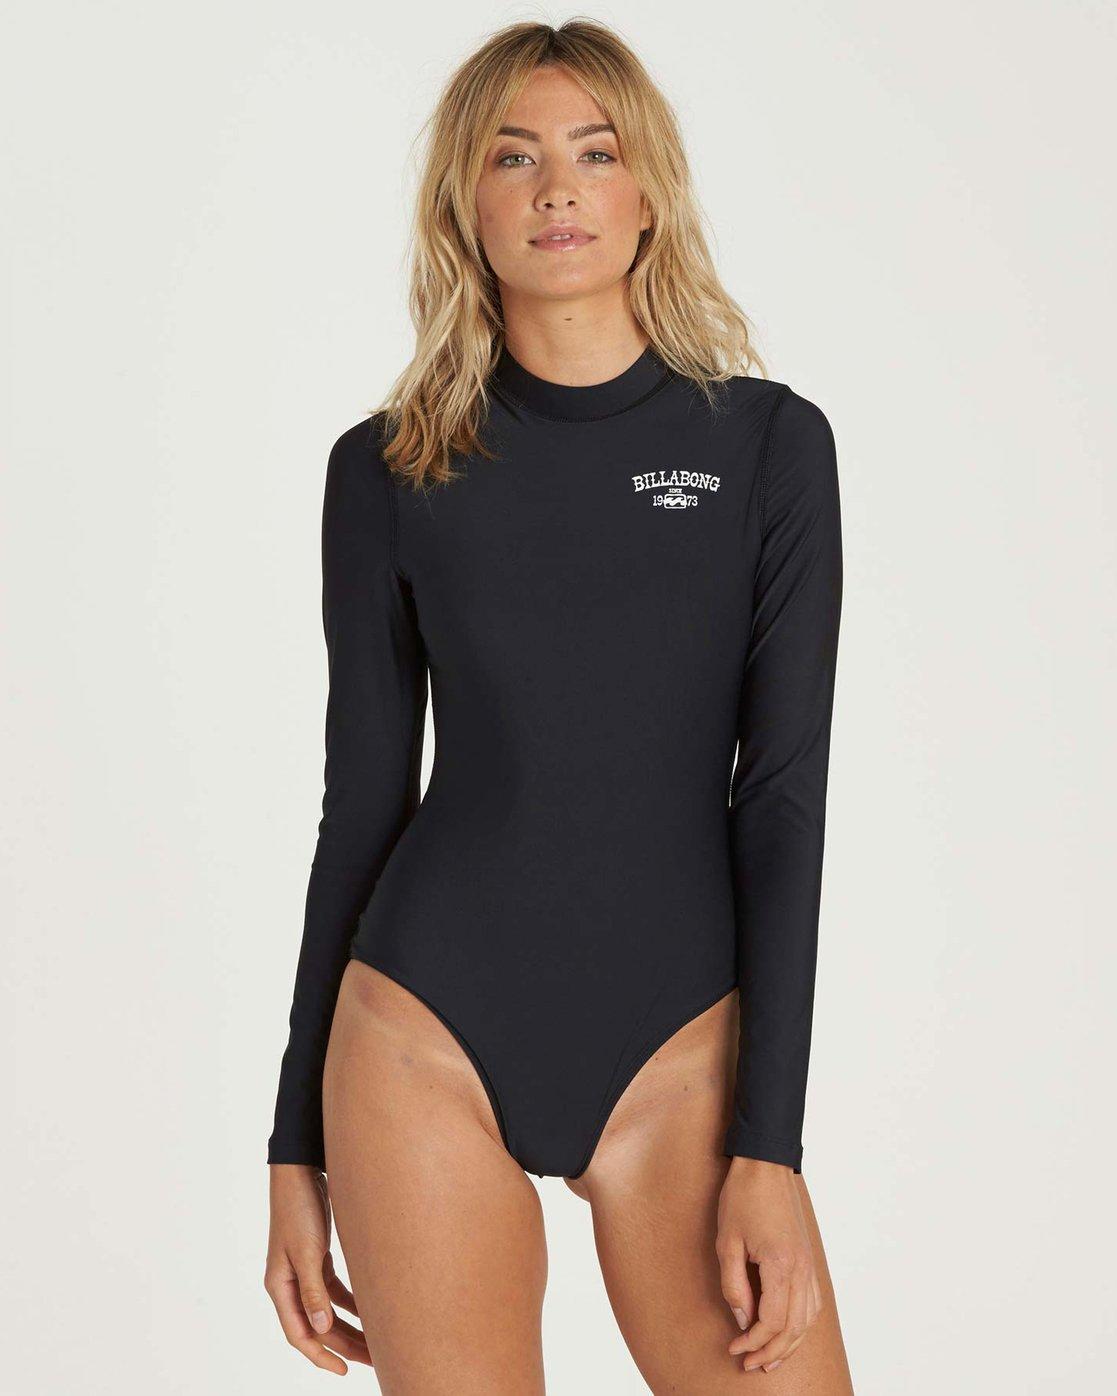 Billabong Womens Swim Bodysuit